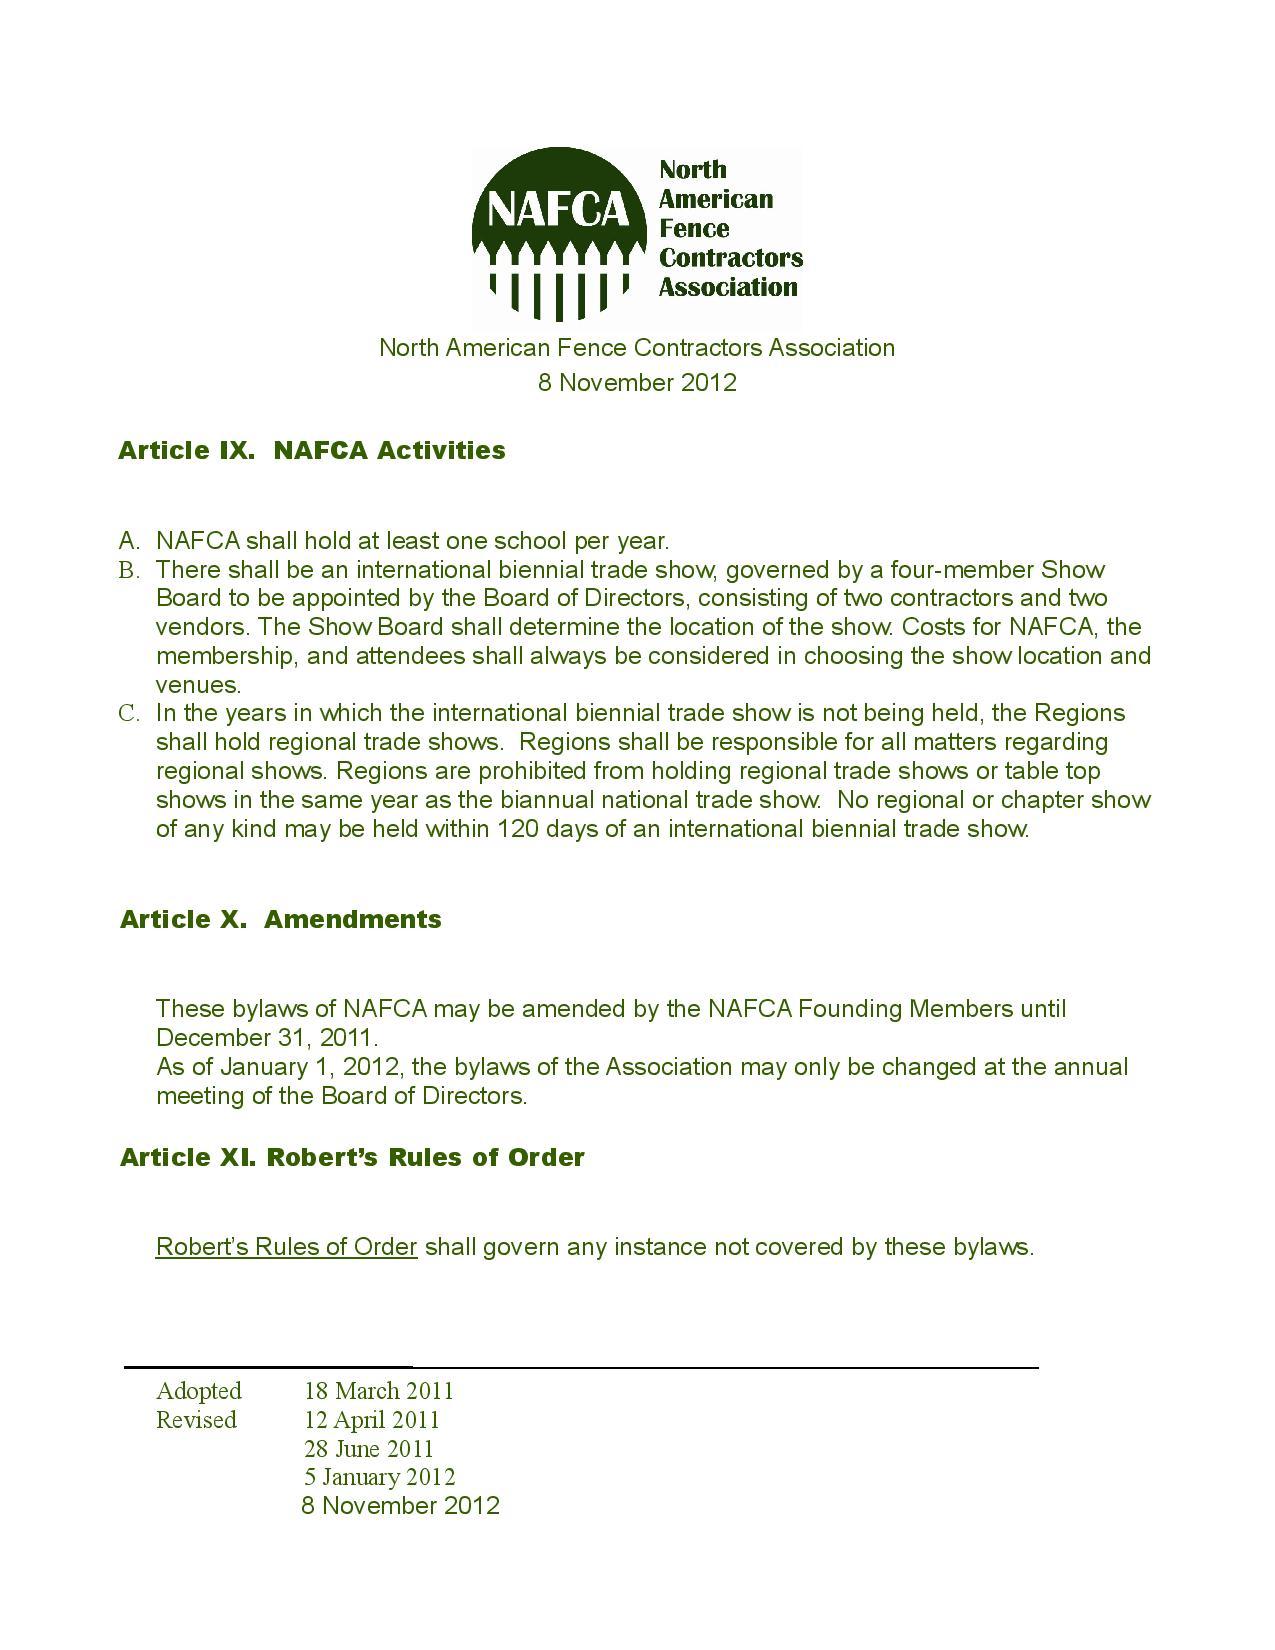 NAFCA Bylaws 8 11 2012-page-004